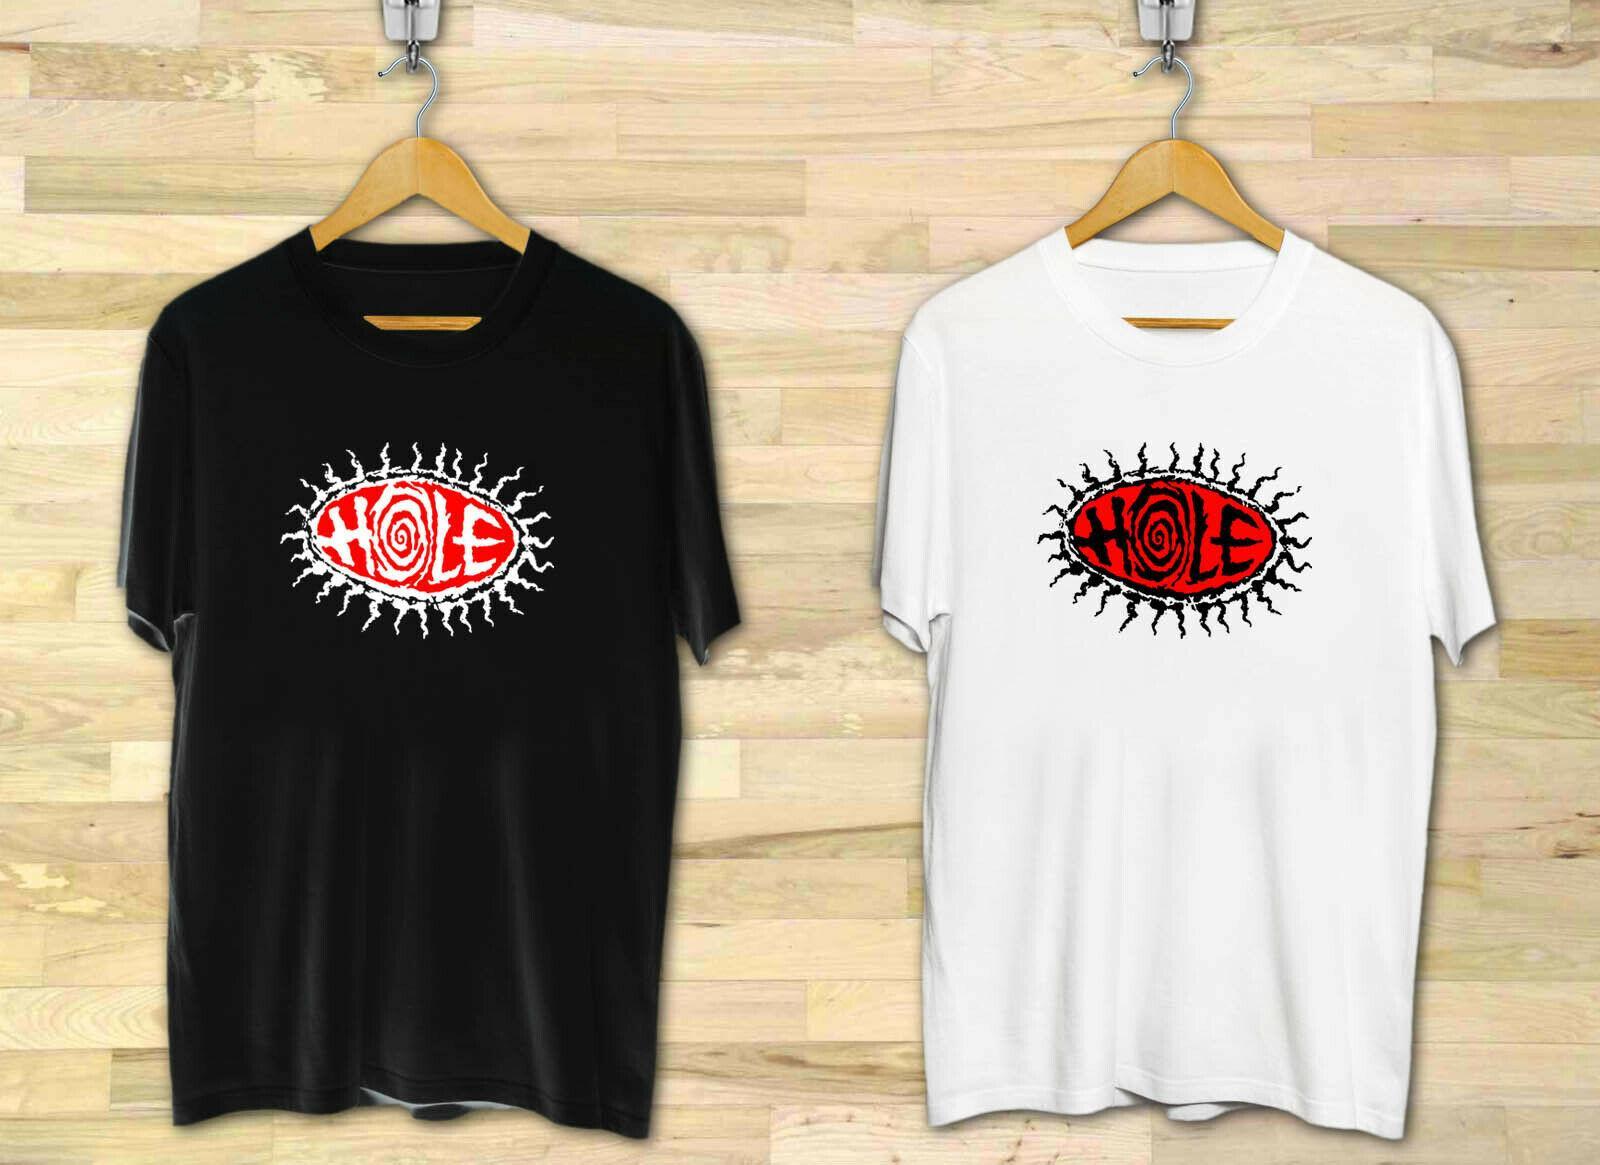 New Hole 90/'s Alternative Rock Band Men/'s Black T-Shirt Size S to 3XL